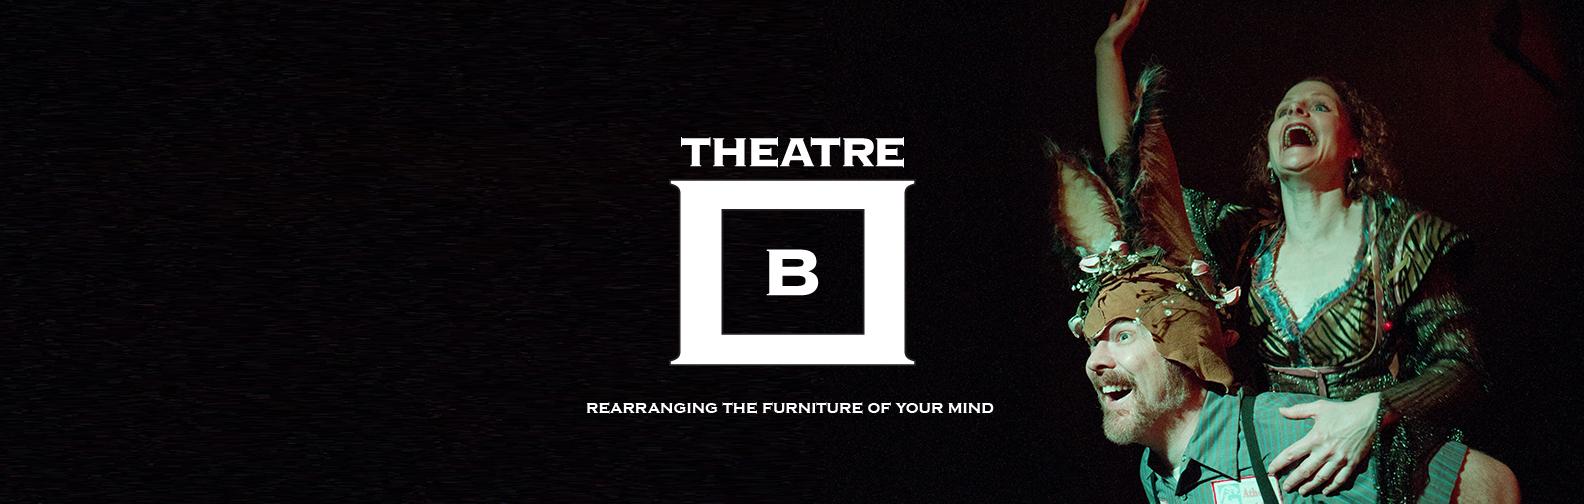 Theatre B.jpg